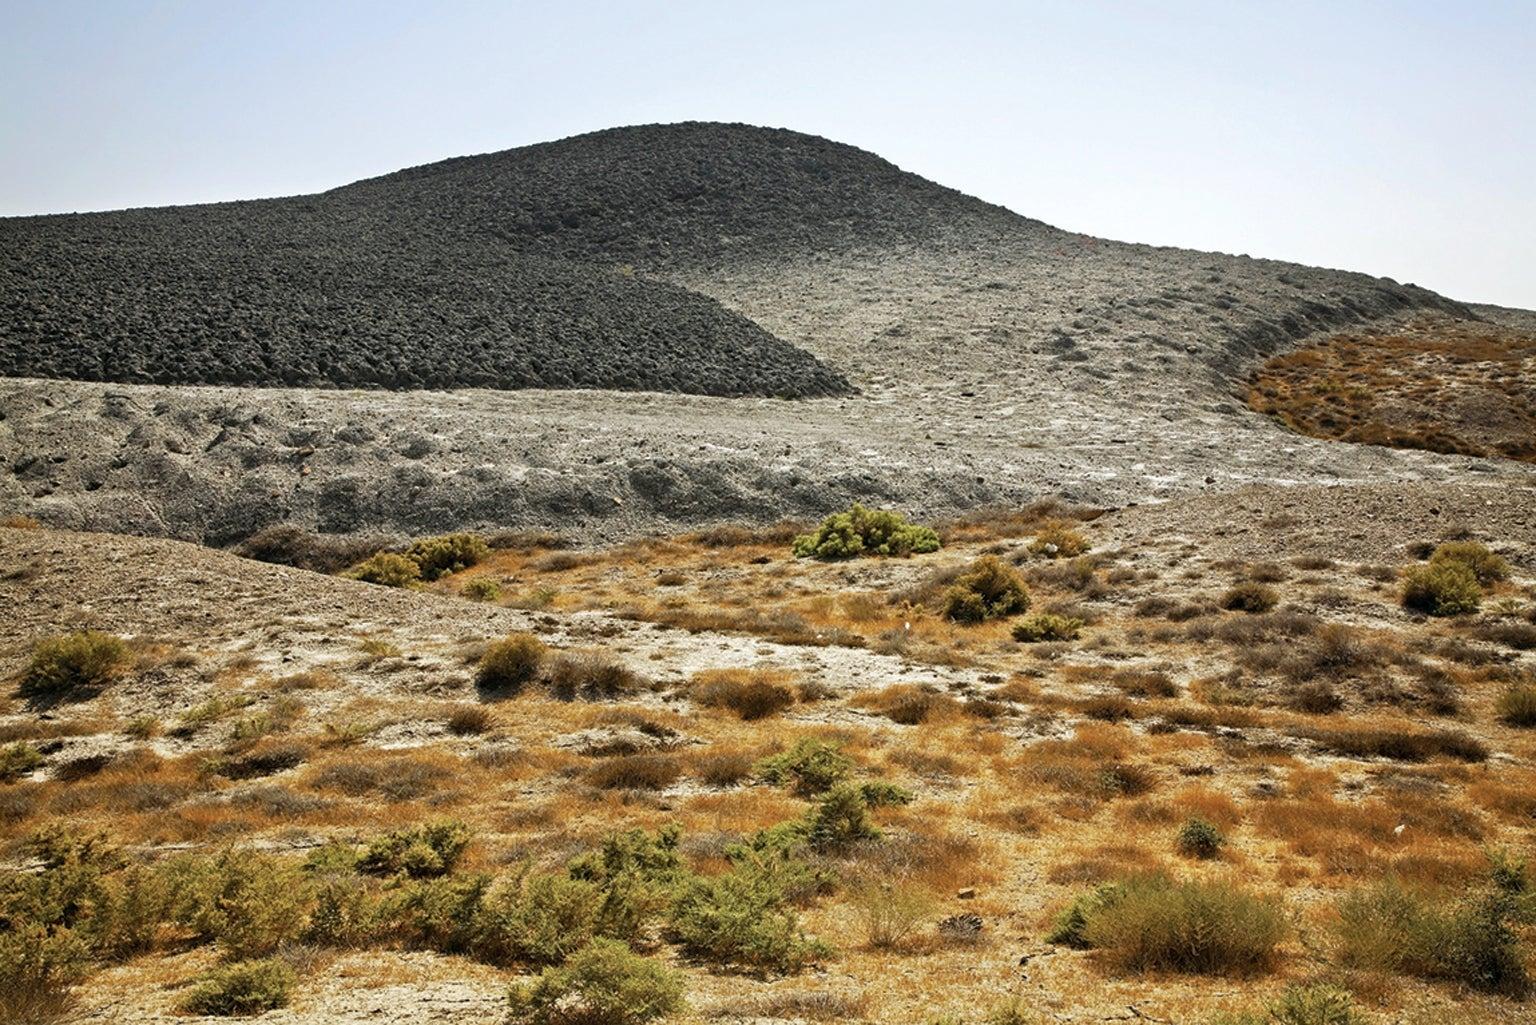 <p>Giant Mud Volcano Reveals Its Powerful Explosive Secrets thumbnail